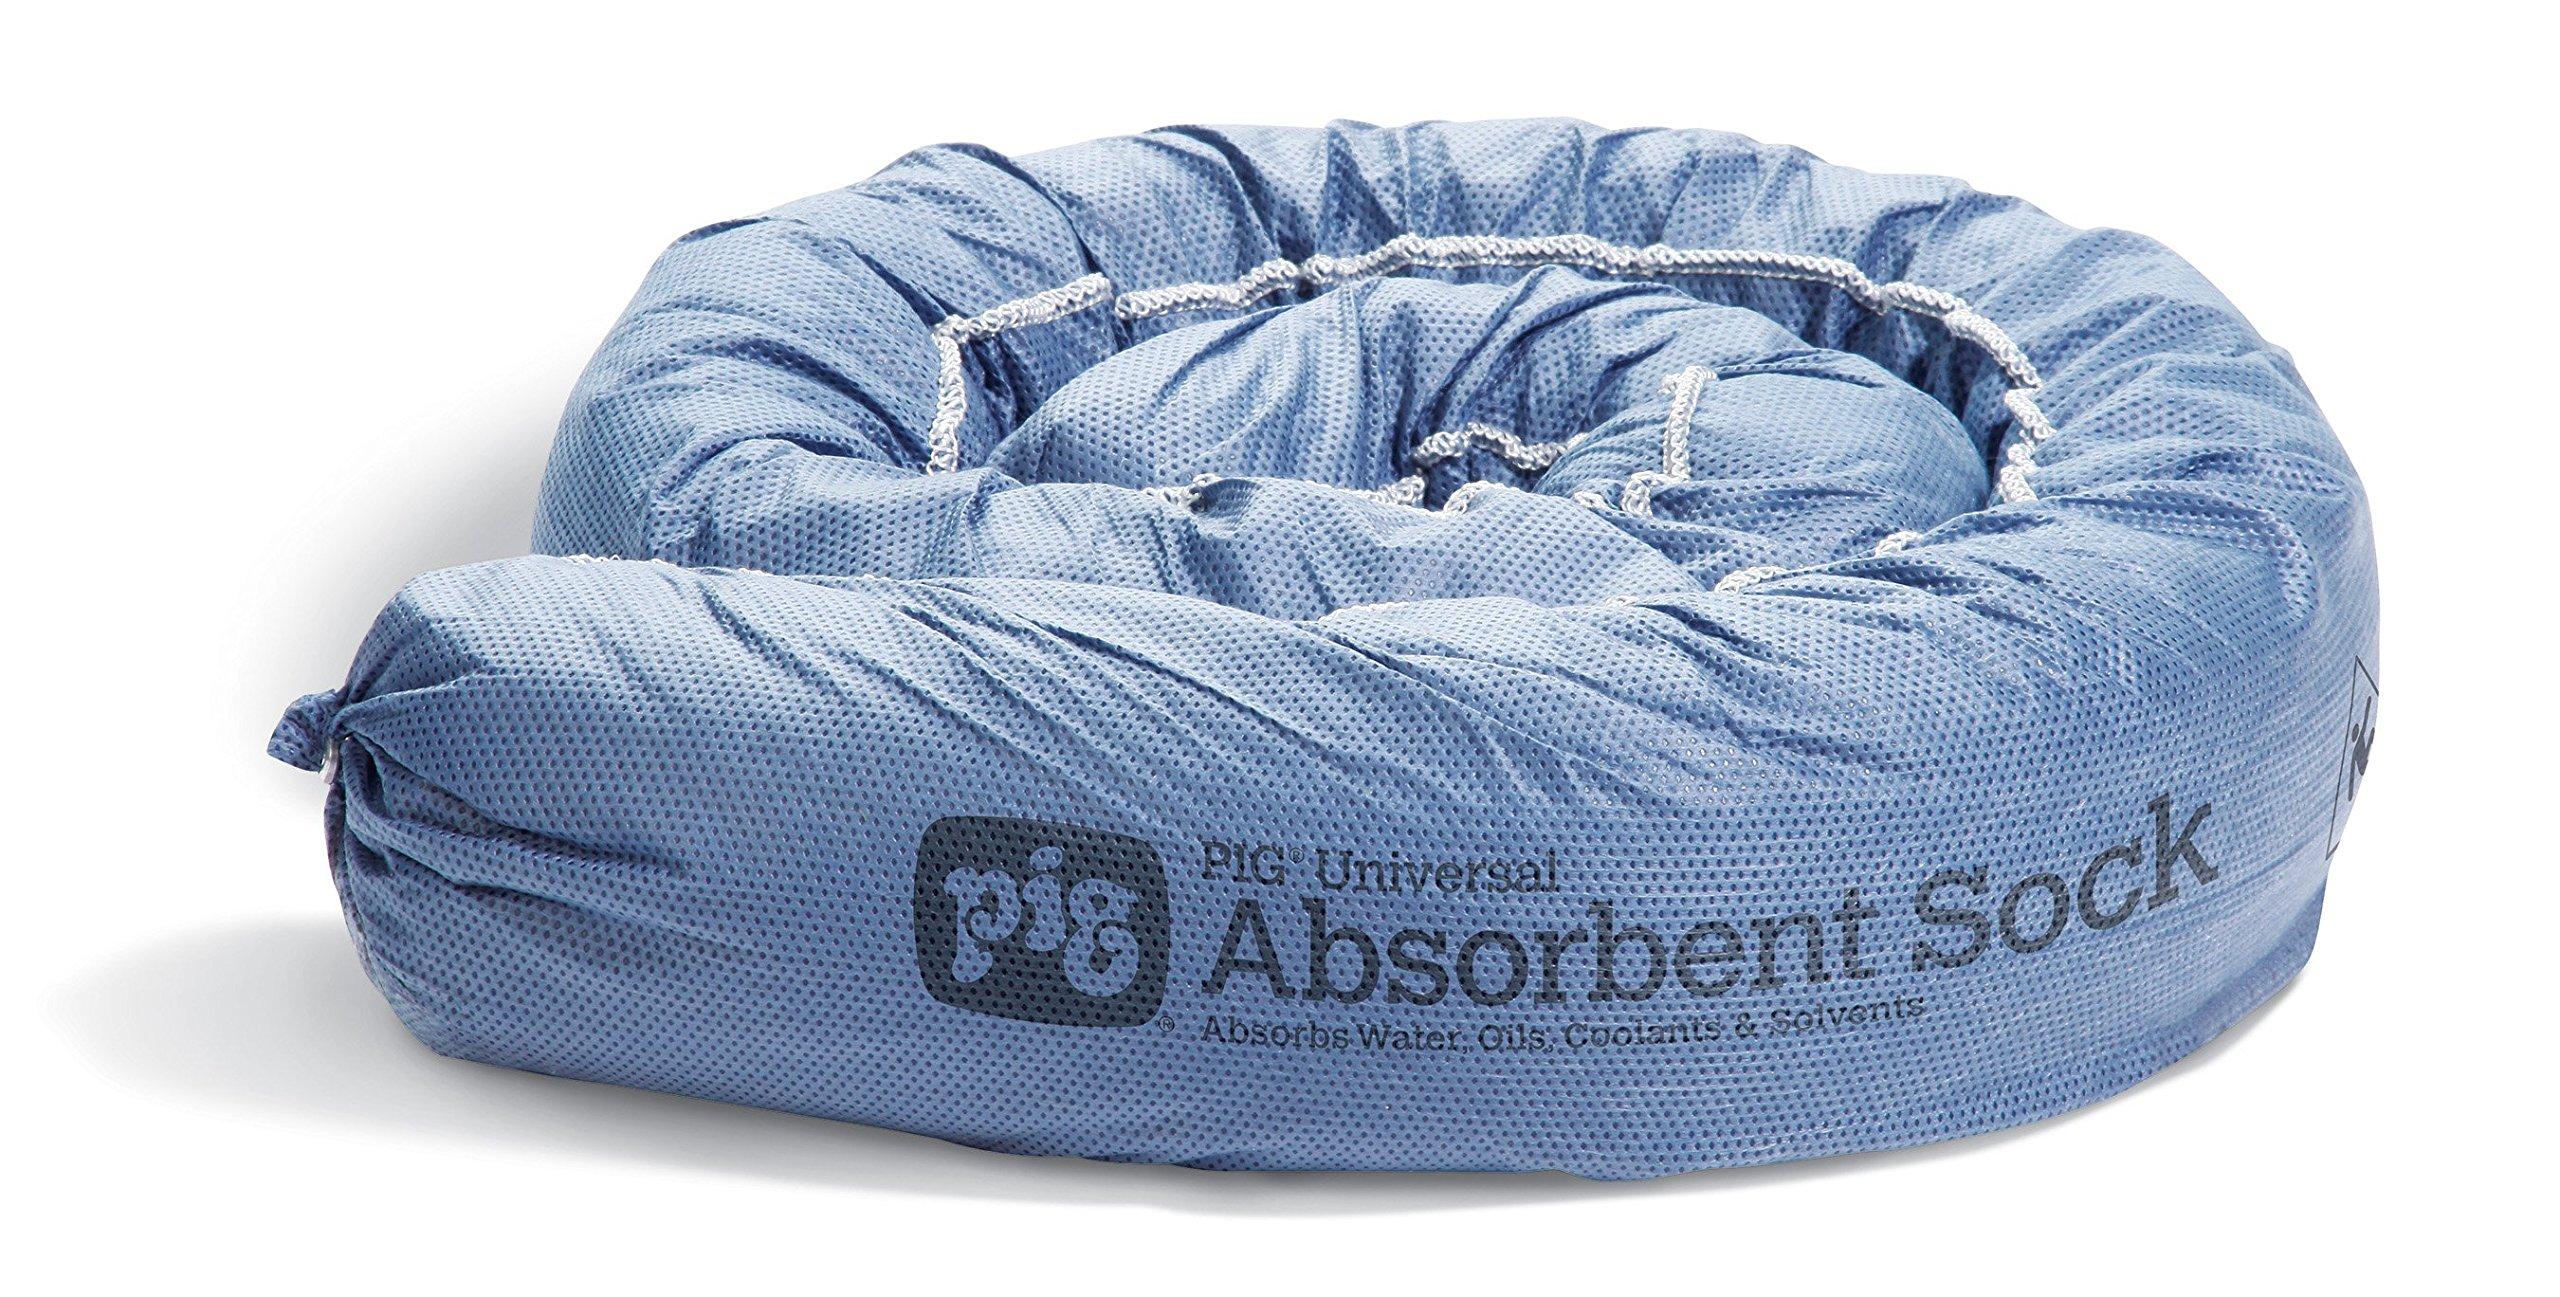 New Pig Mildew-Resistant Absorbent Sock, Water Absorbing Snake, 1-Gal Absorbency, 48'' L x 3'' Diam, Blue (Pack of 12), PIG105-BL